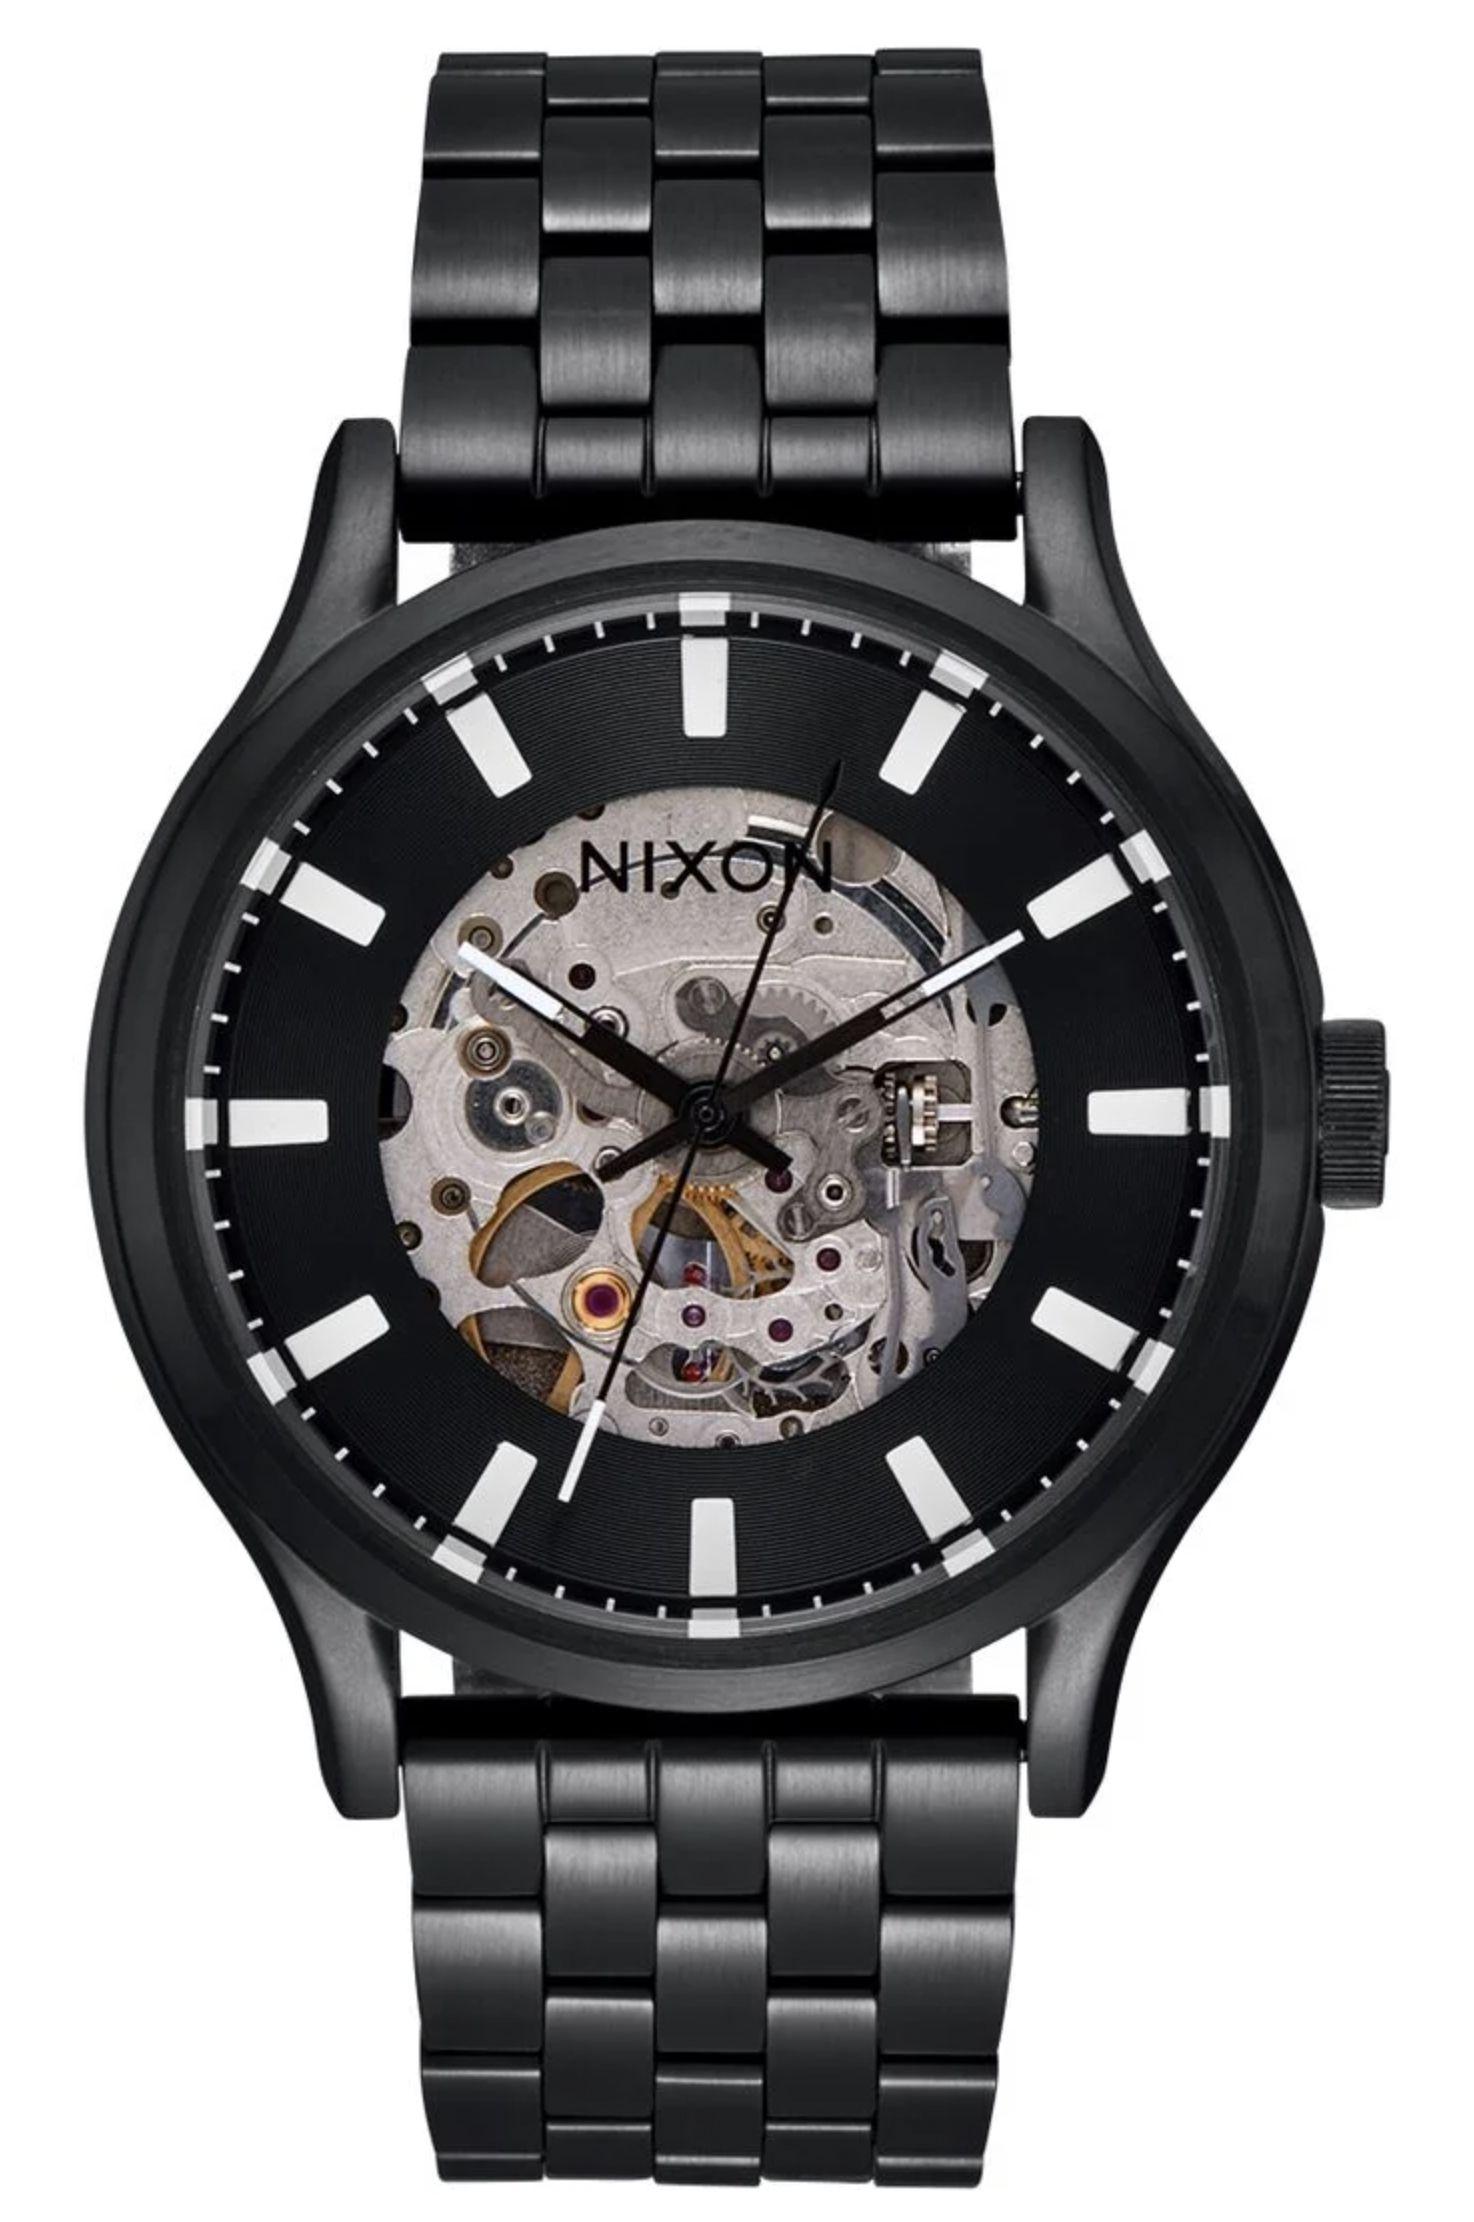 Nixon Watch SPECTRA Black/Black